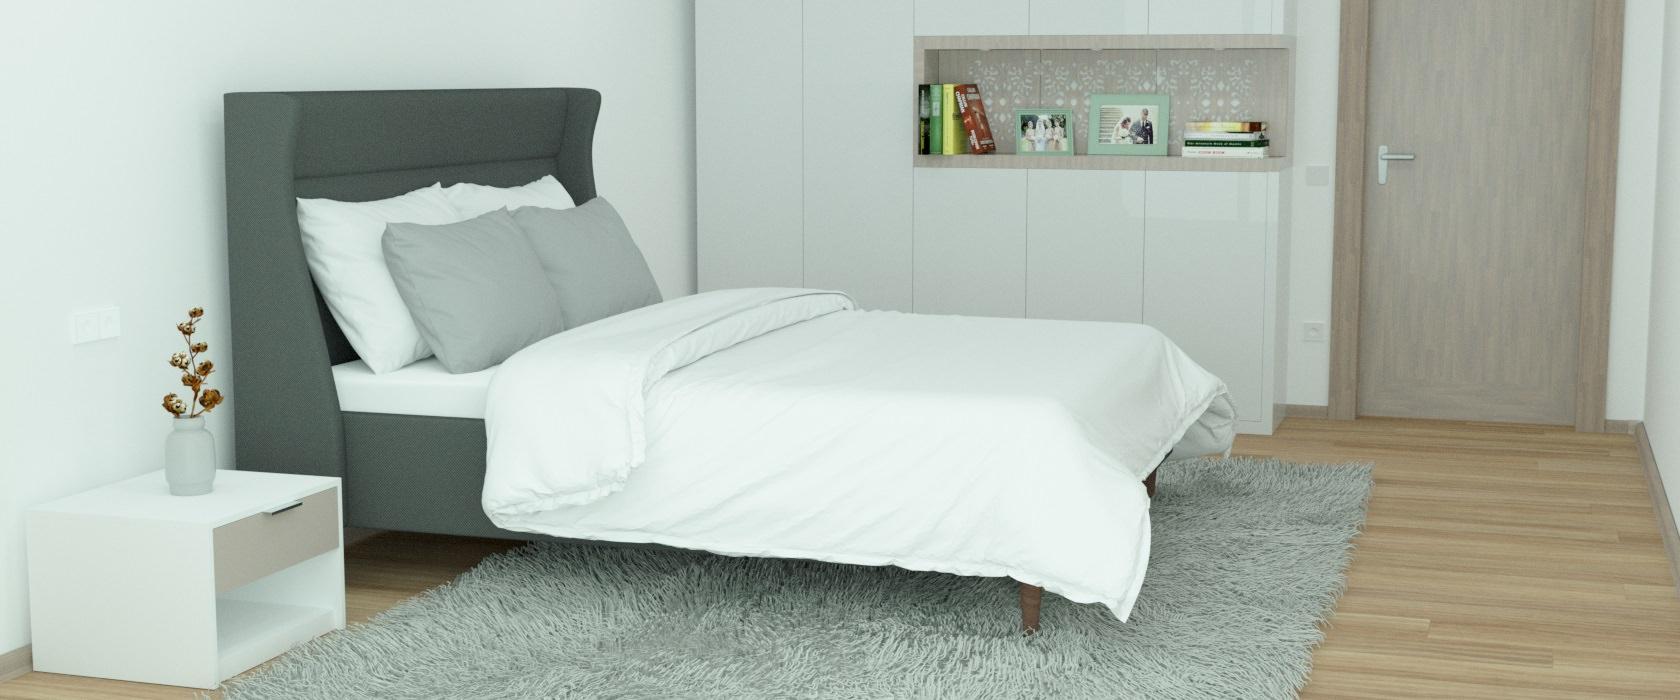 Ліжко Crona - Фото 2 - Pufetto